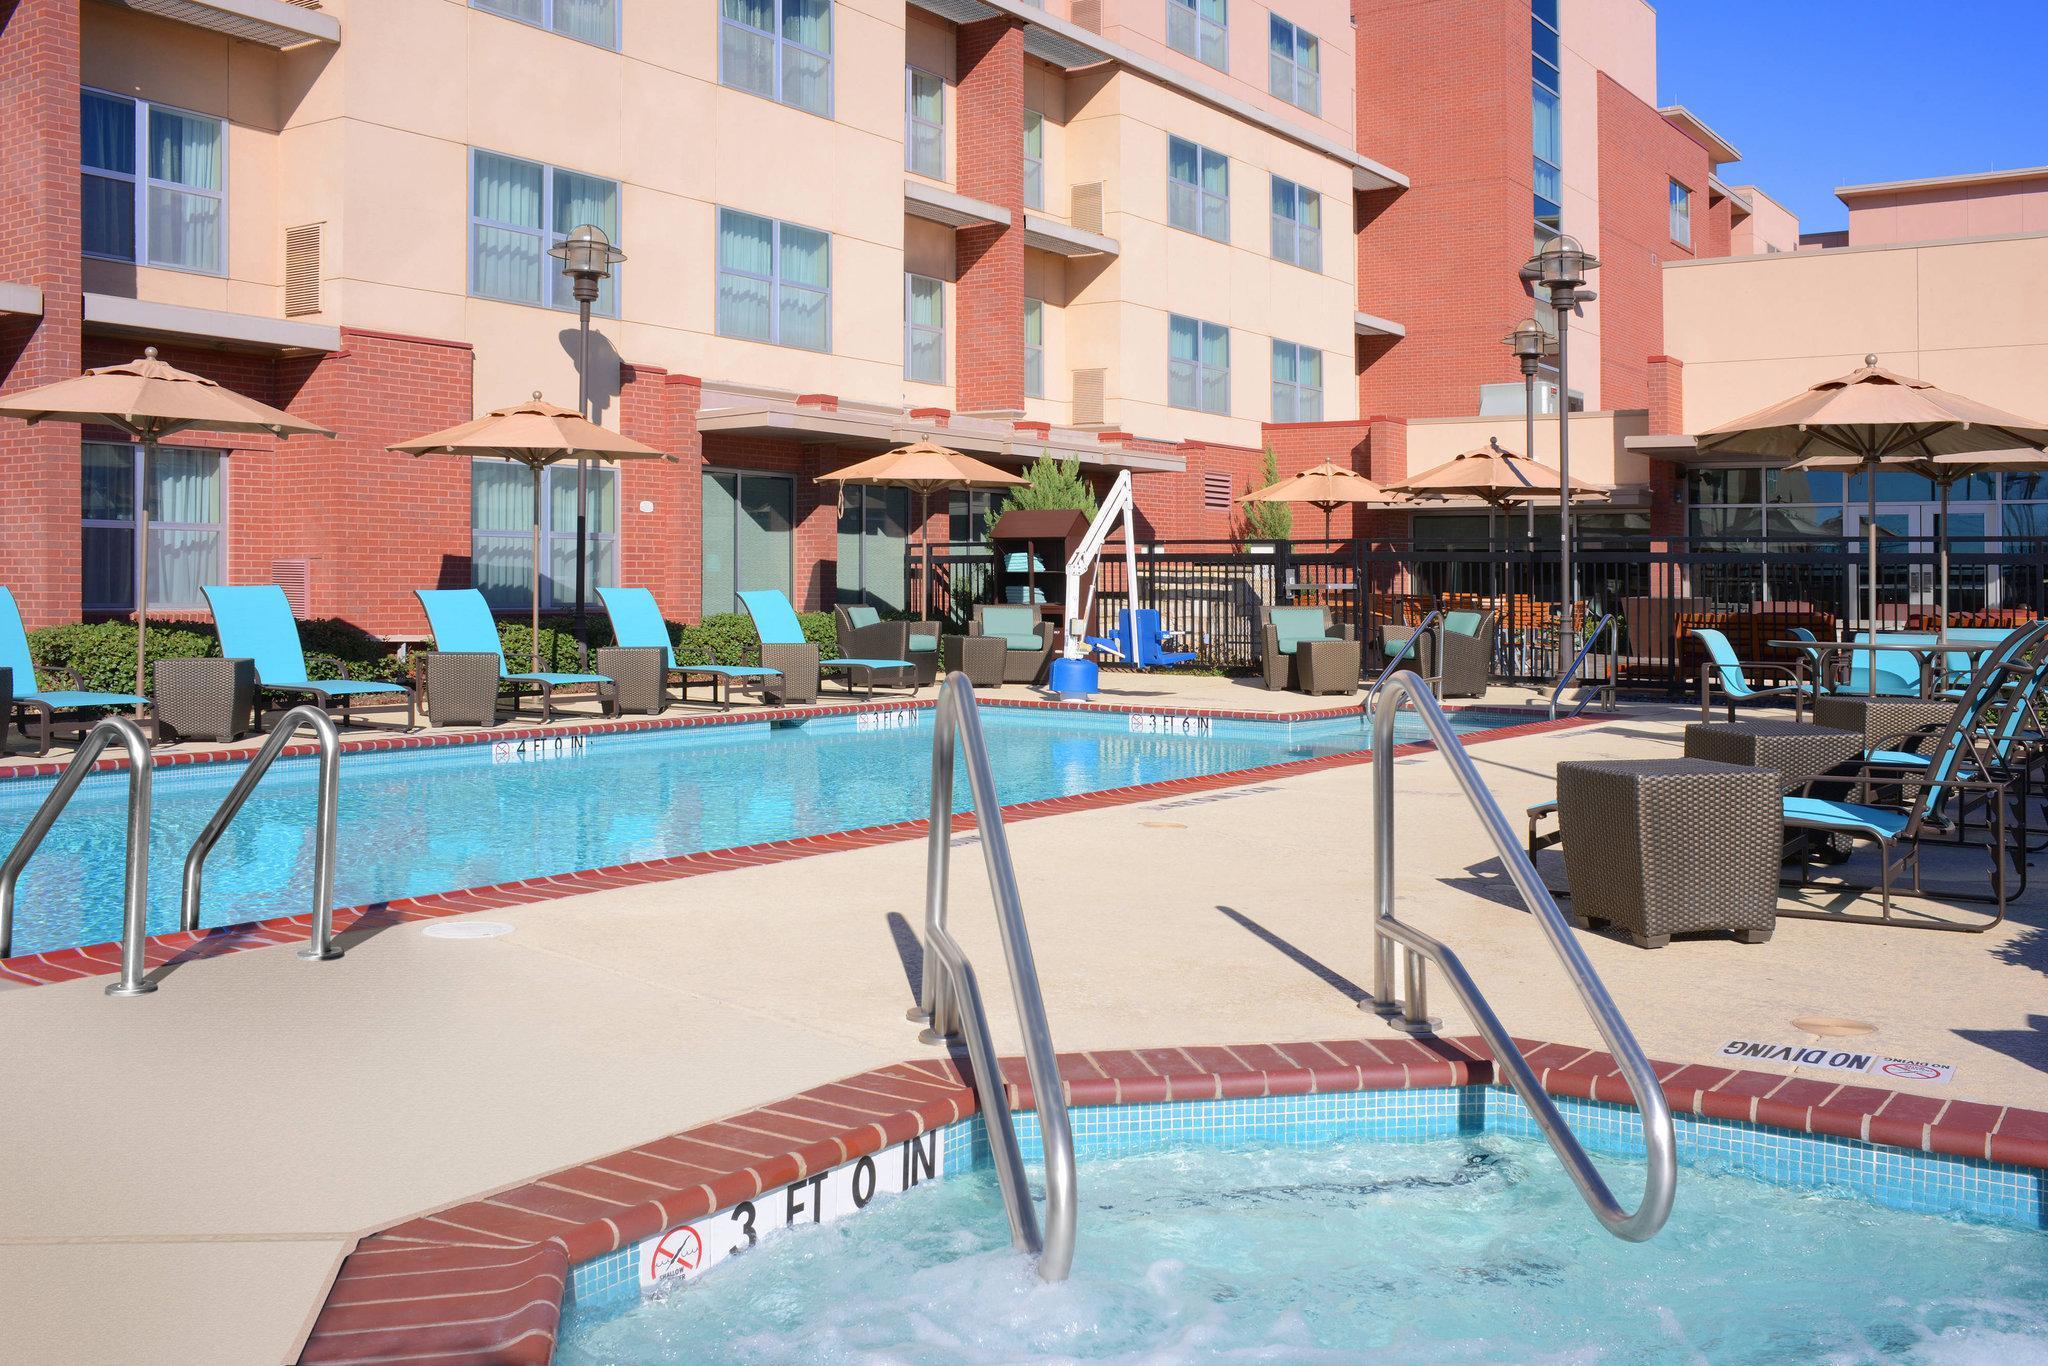 Residence Inn by Marriott Dallas Plano/The Colony, Denton